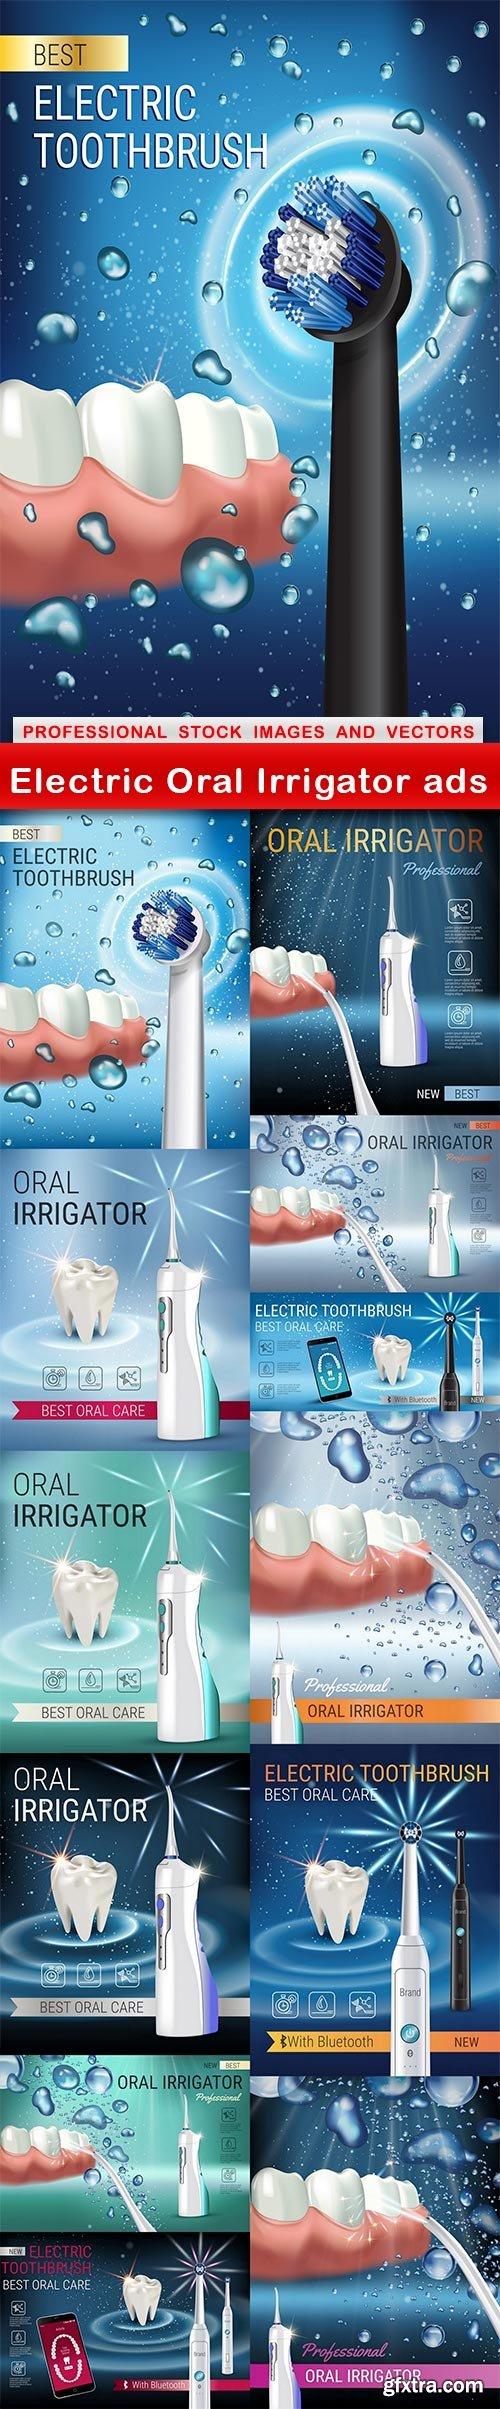 Electric Oral Irrigator ads - 13 UHQ JPEG